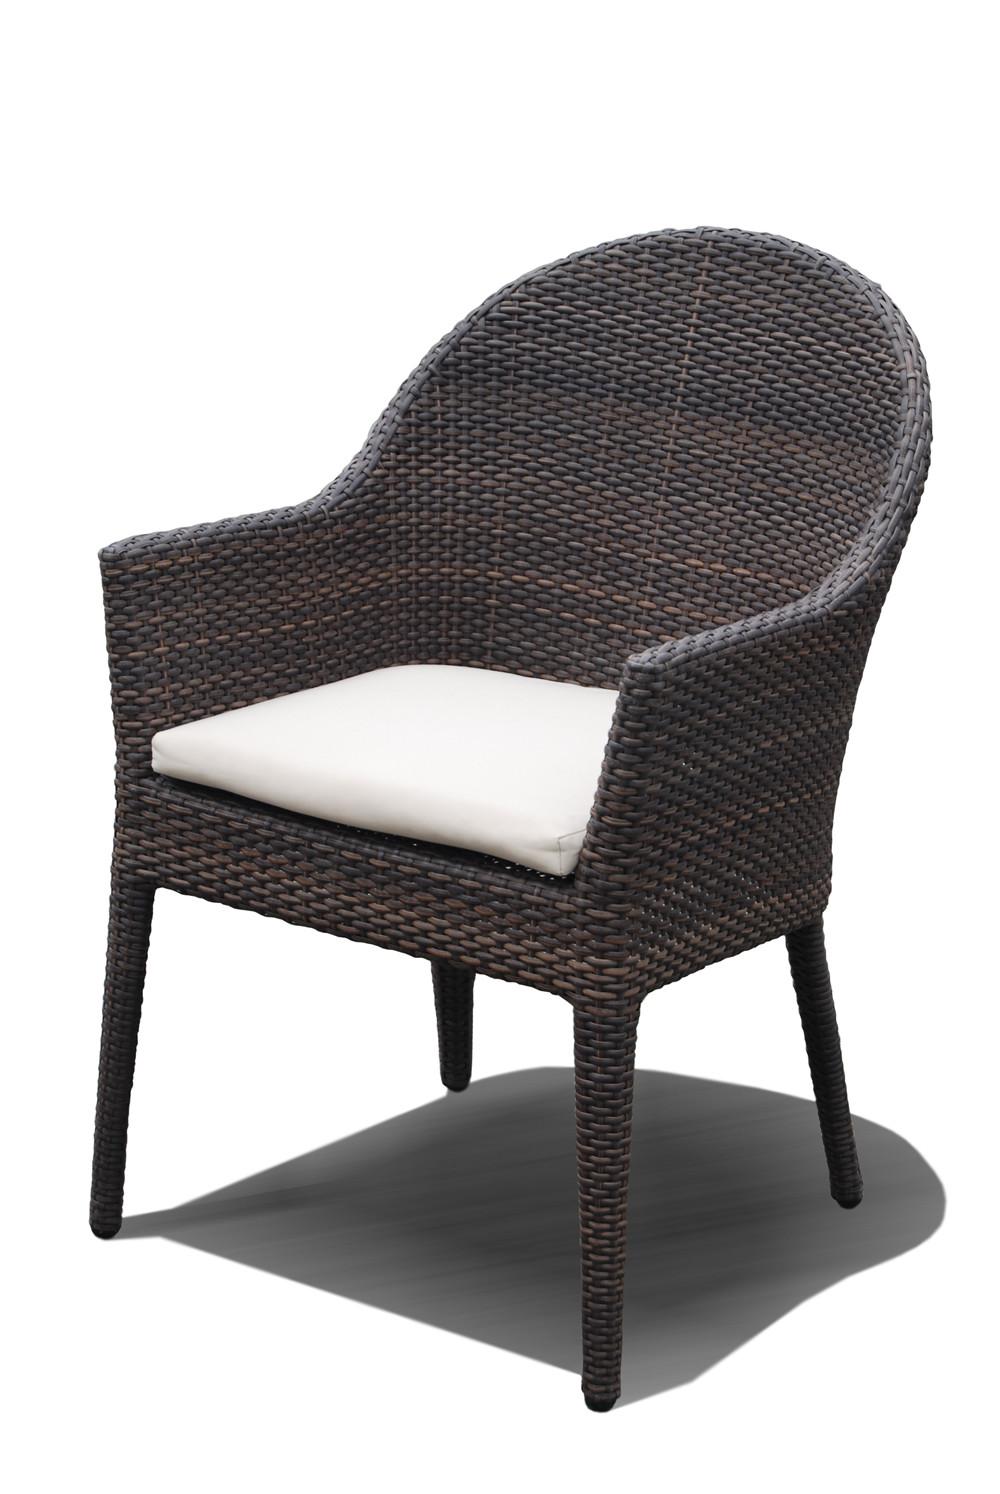 Hospitality rattan kenya wicker dining chair